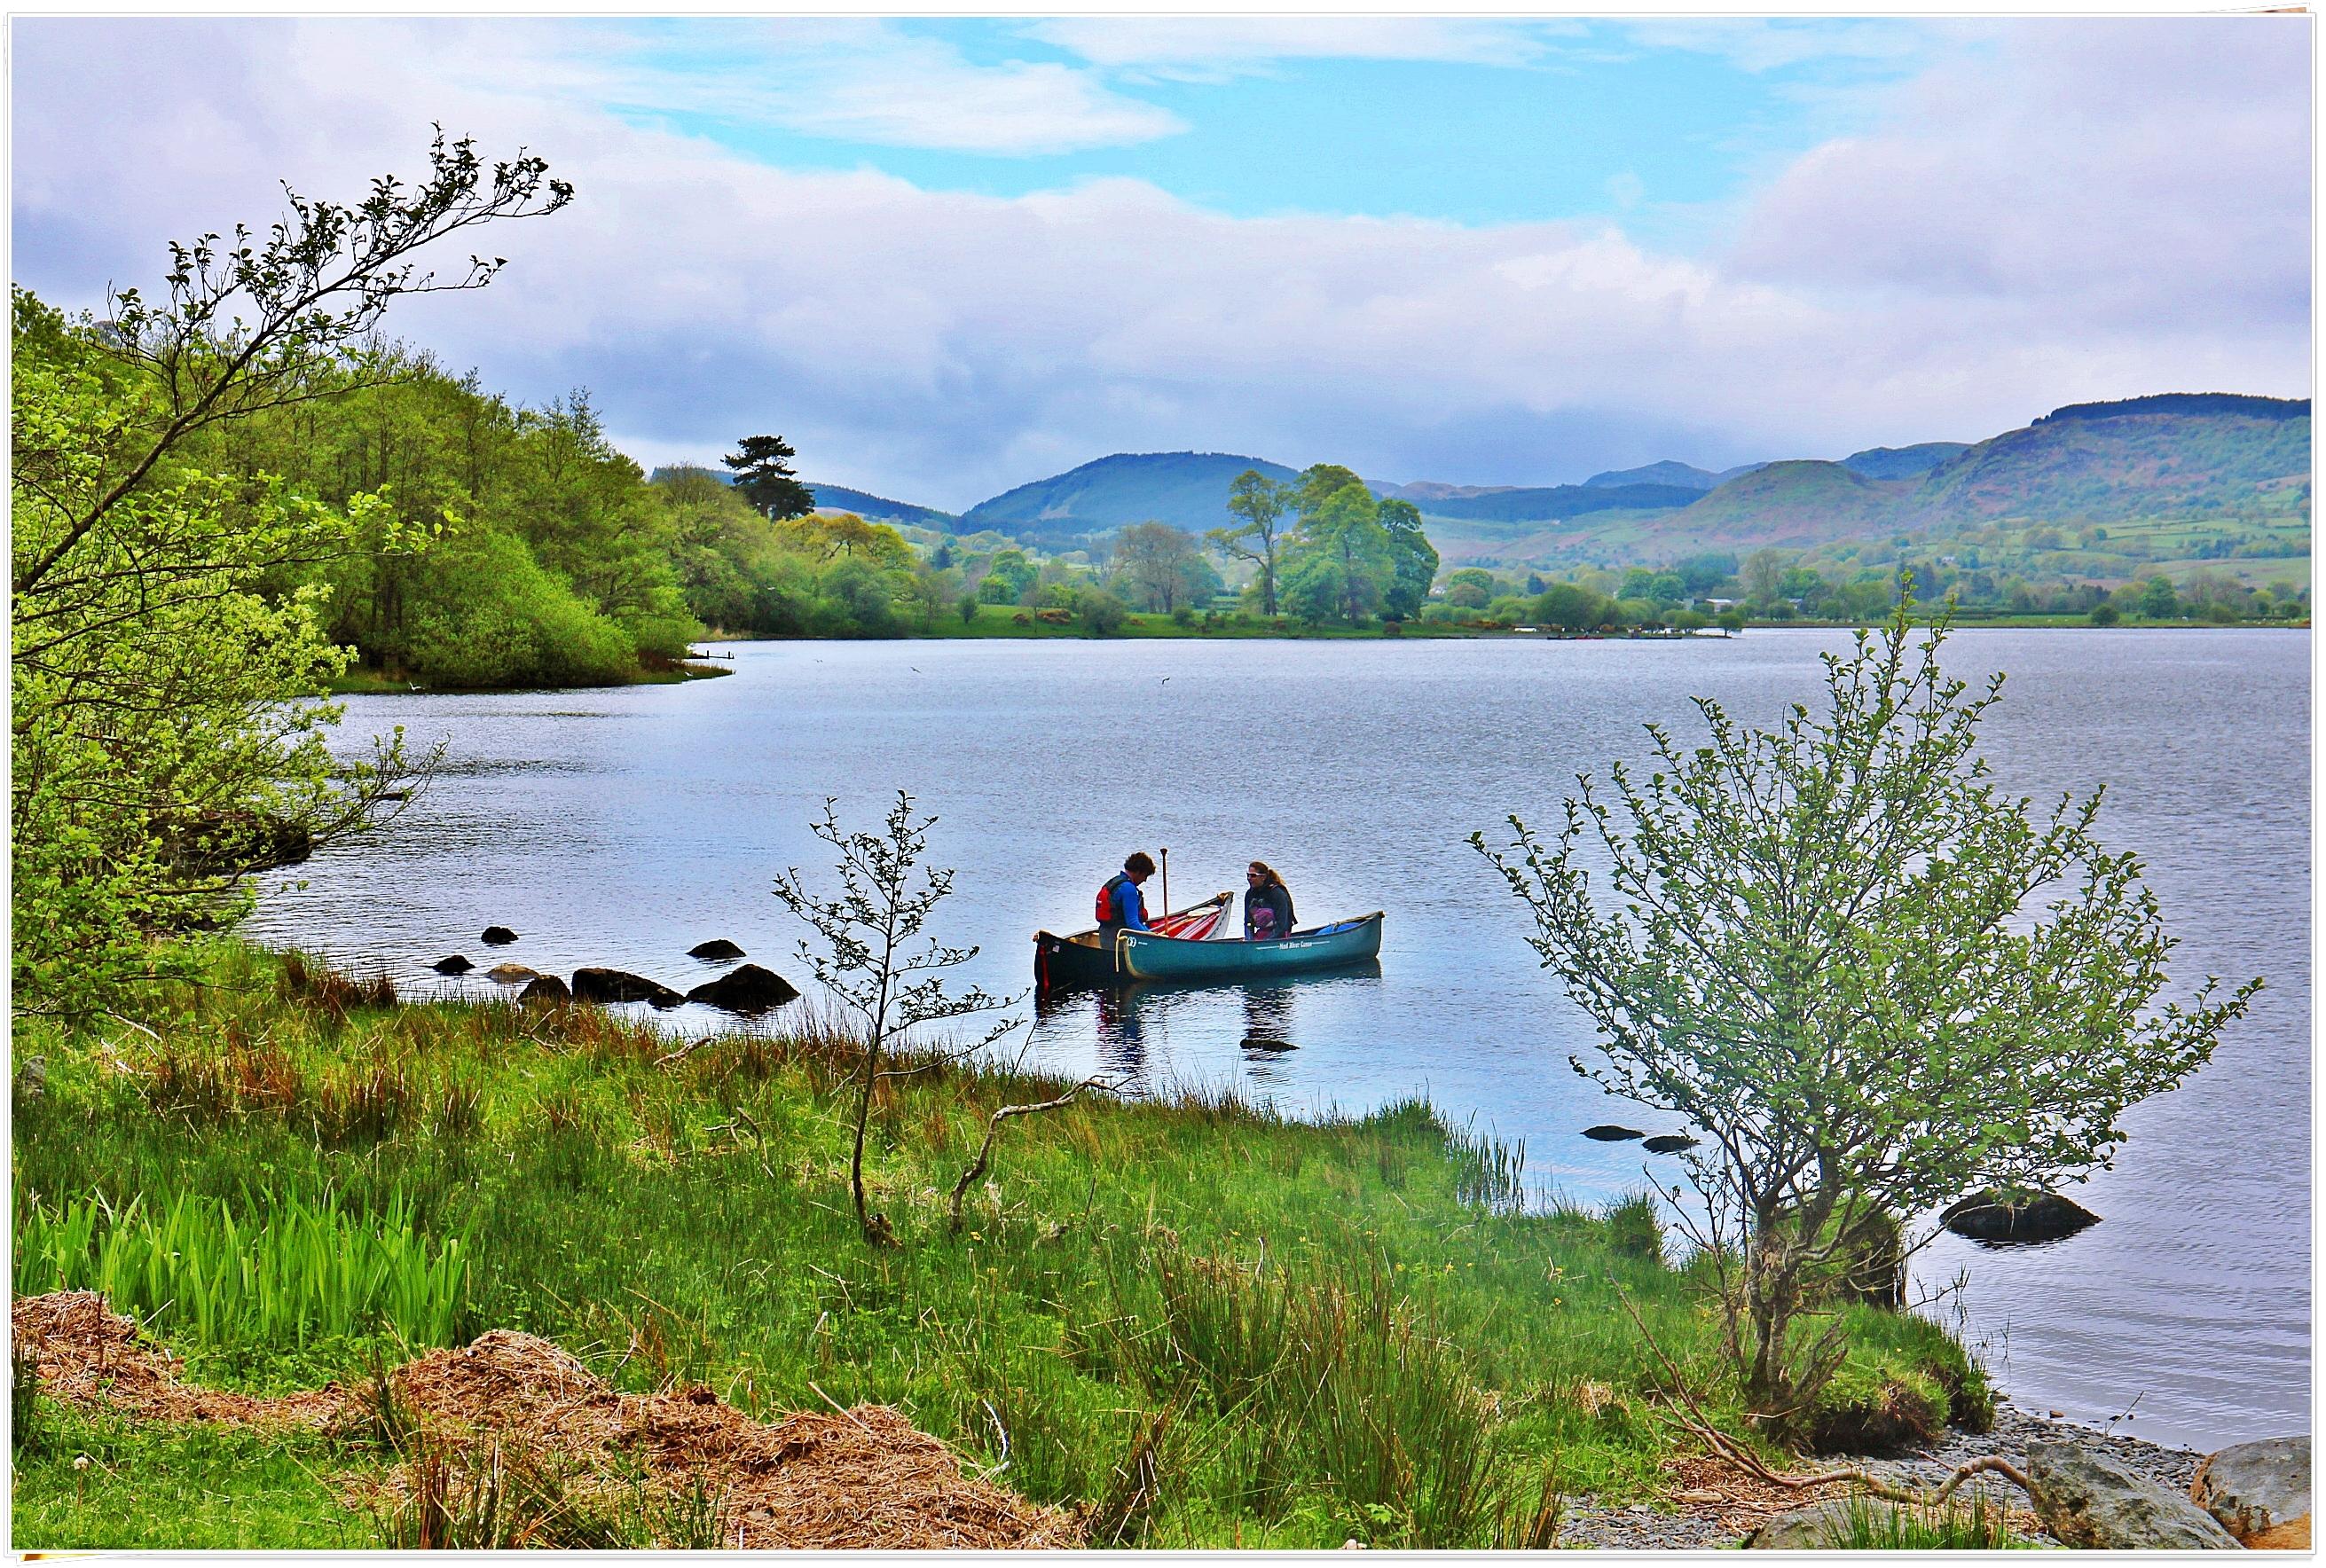 Bala Lake, Snowdonia, Wales - 2015